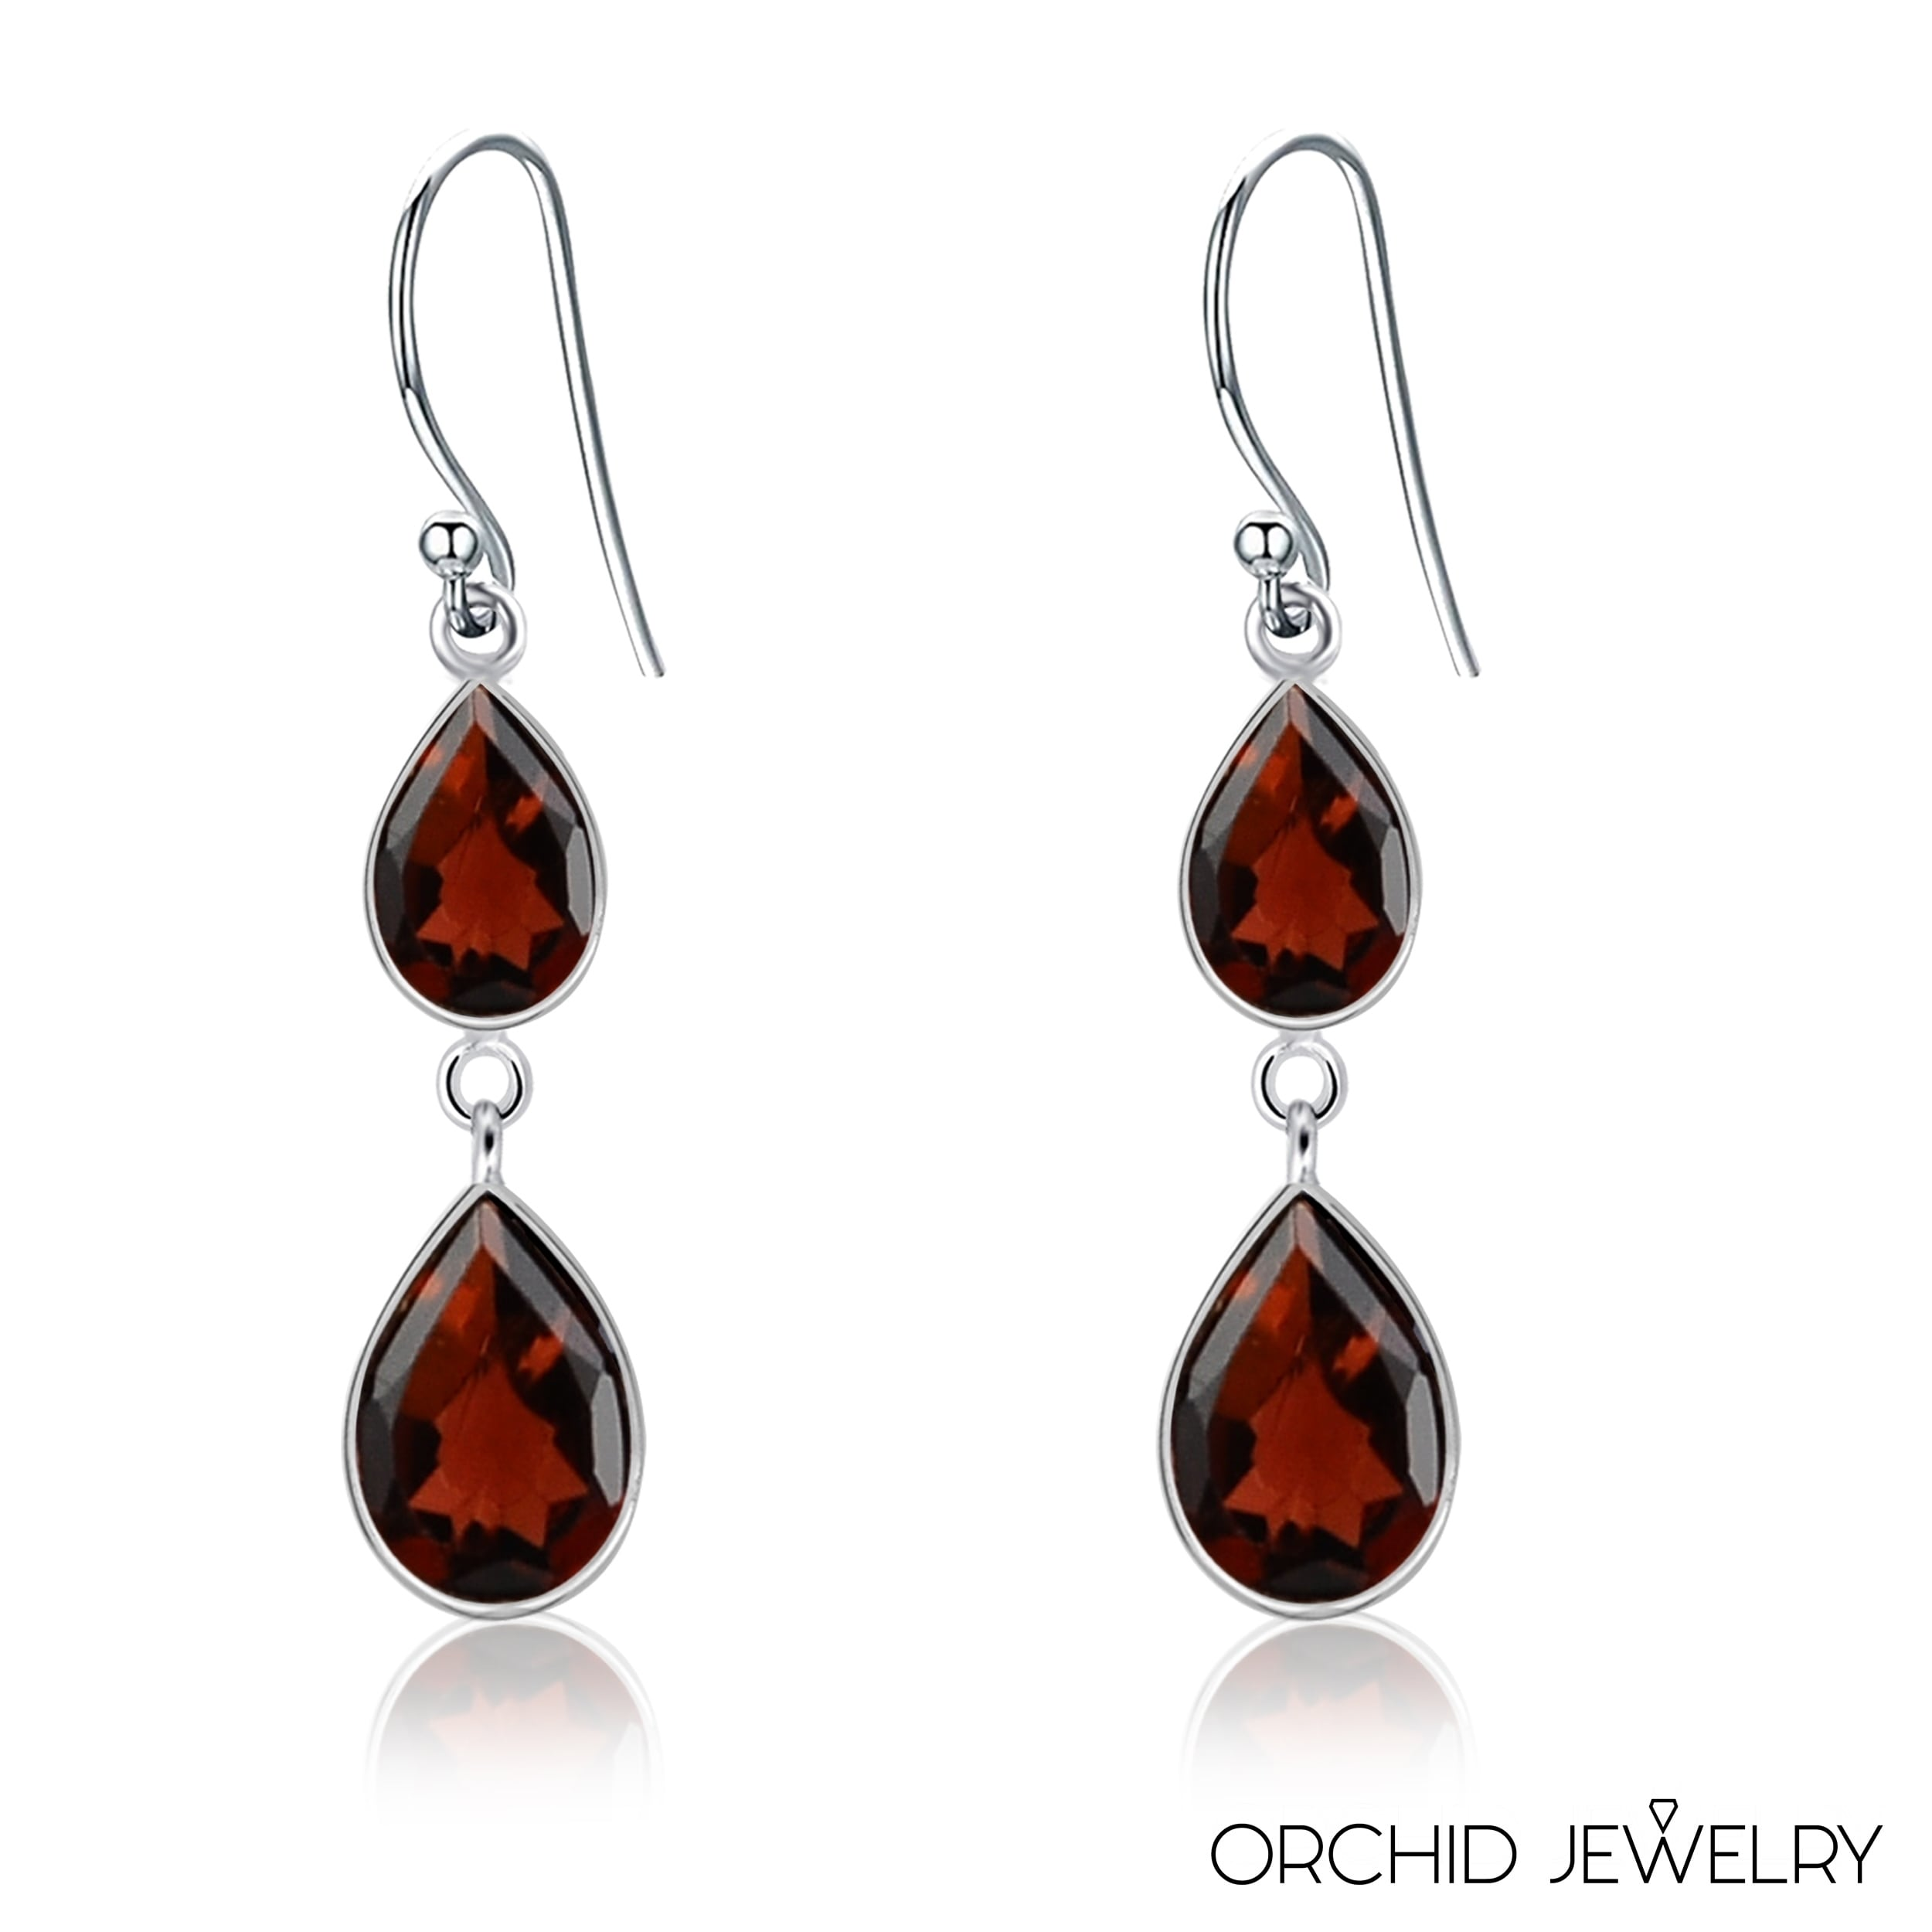 Earrings Natural Amber Gold Pear Gemstones in Sterling Silver Dangle Design Stud